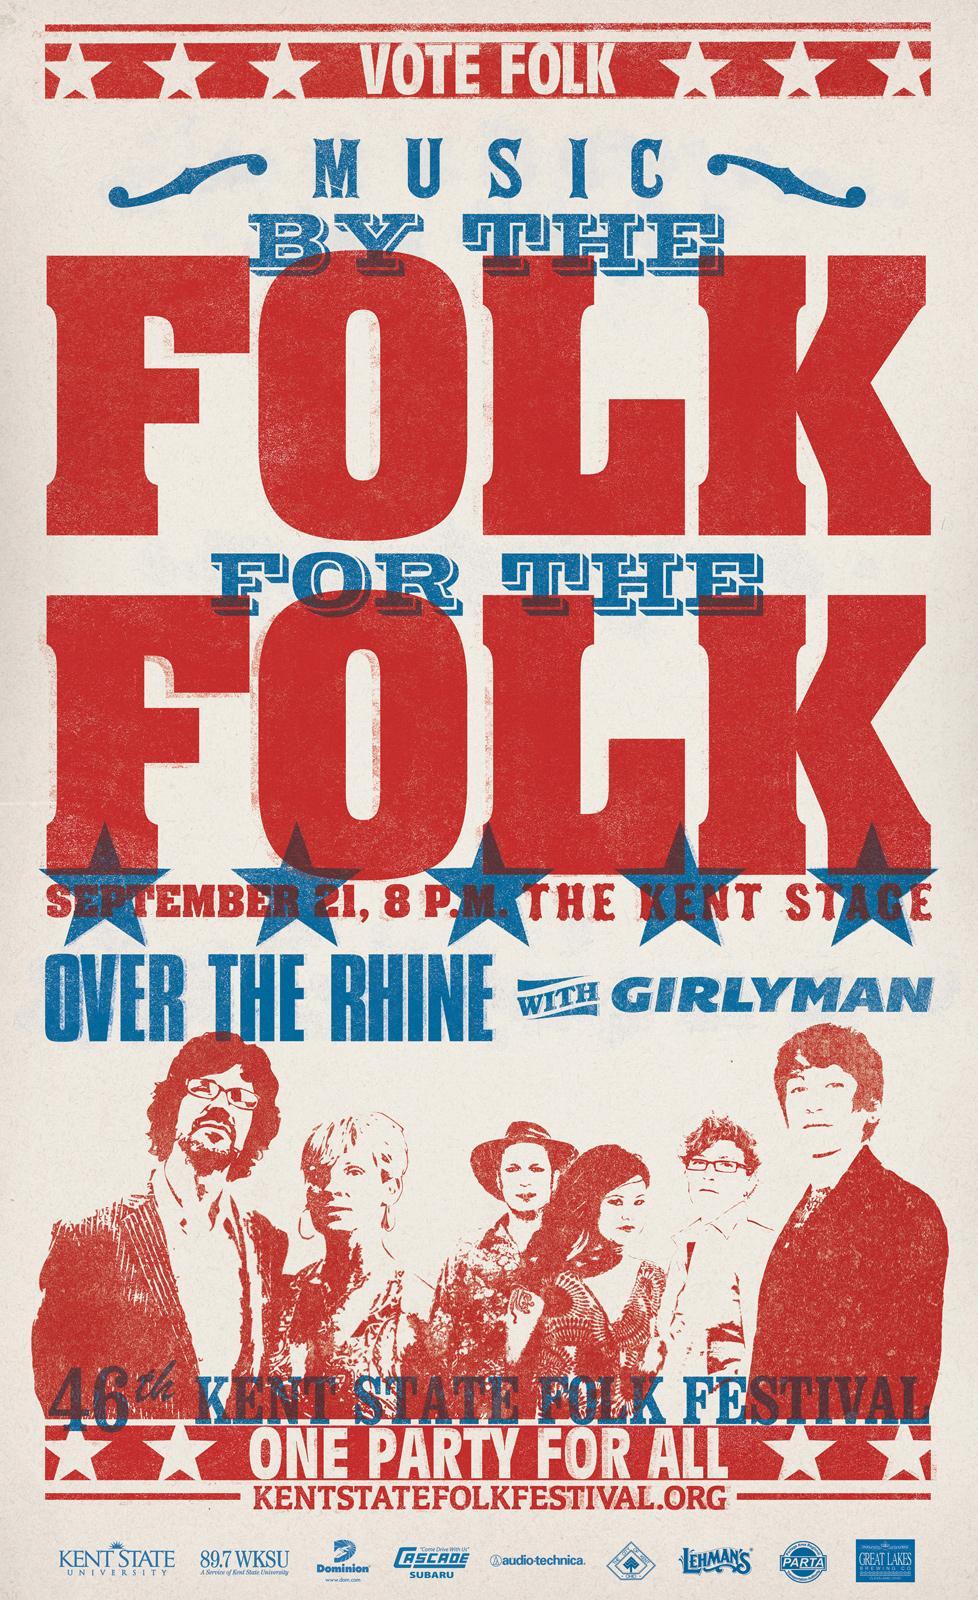 Kent State Folk Festival Outdoor Ad -  Vote Folk, 1